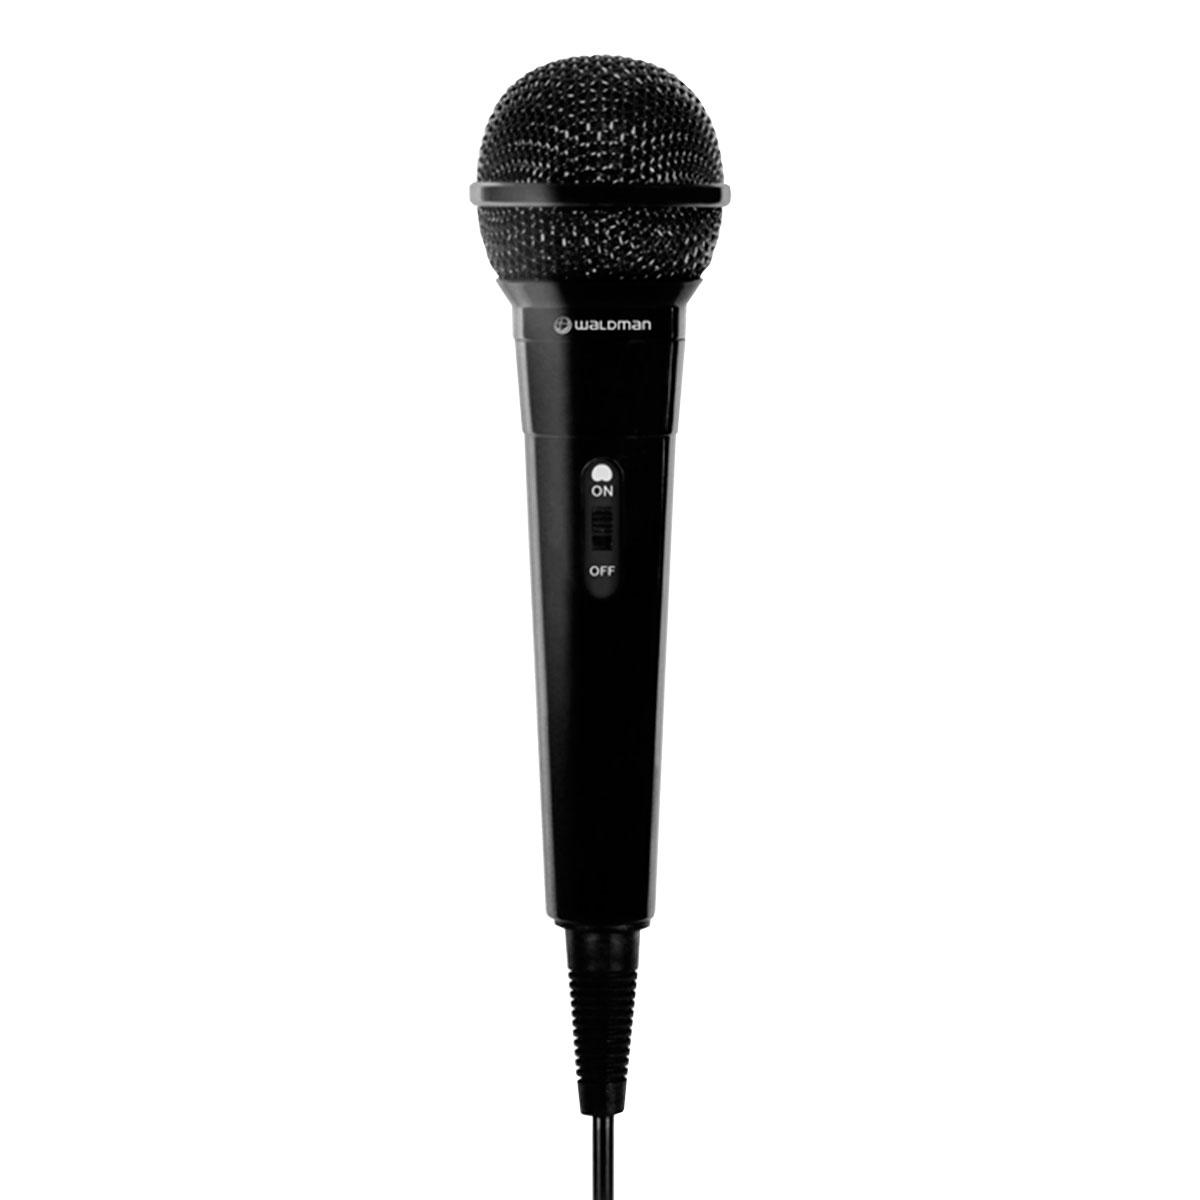 MIC100 - Microfone c/ Fio de M�o MIC 100 - Waldman